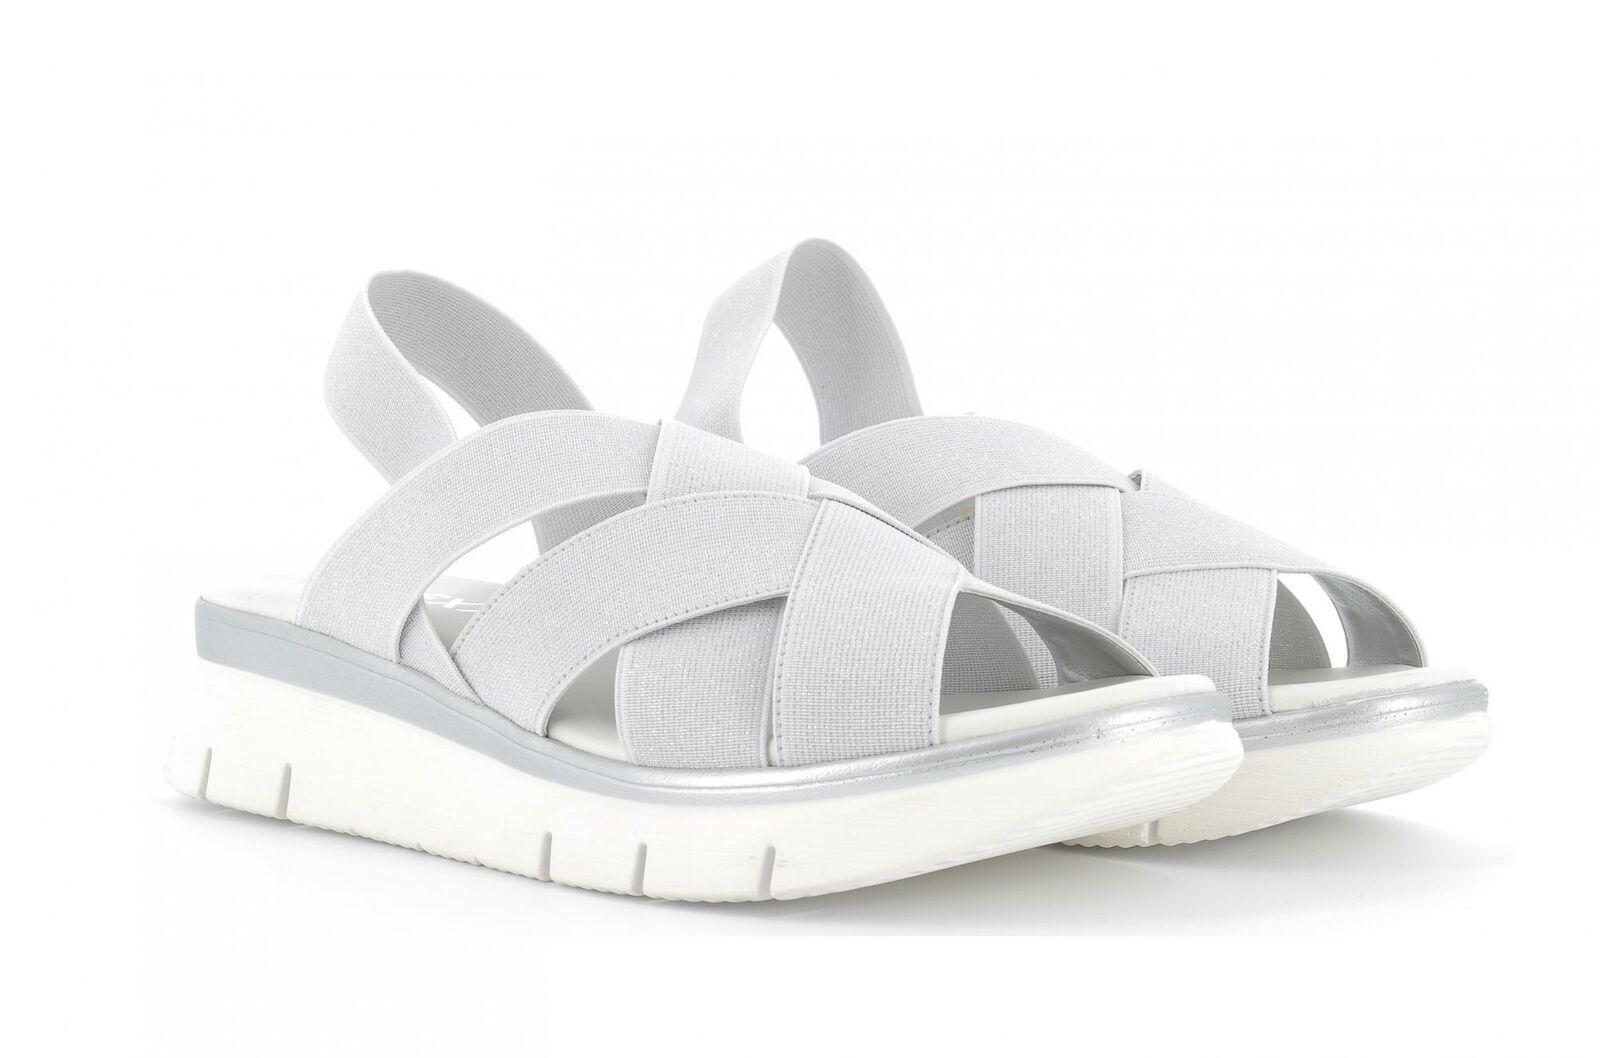 The Flexx P19s zapatos mujer sandalias D2016 19 LORYBETH PLATA